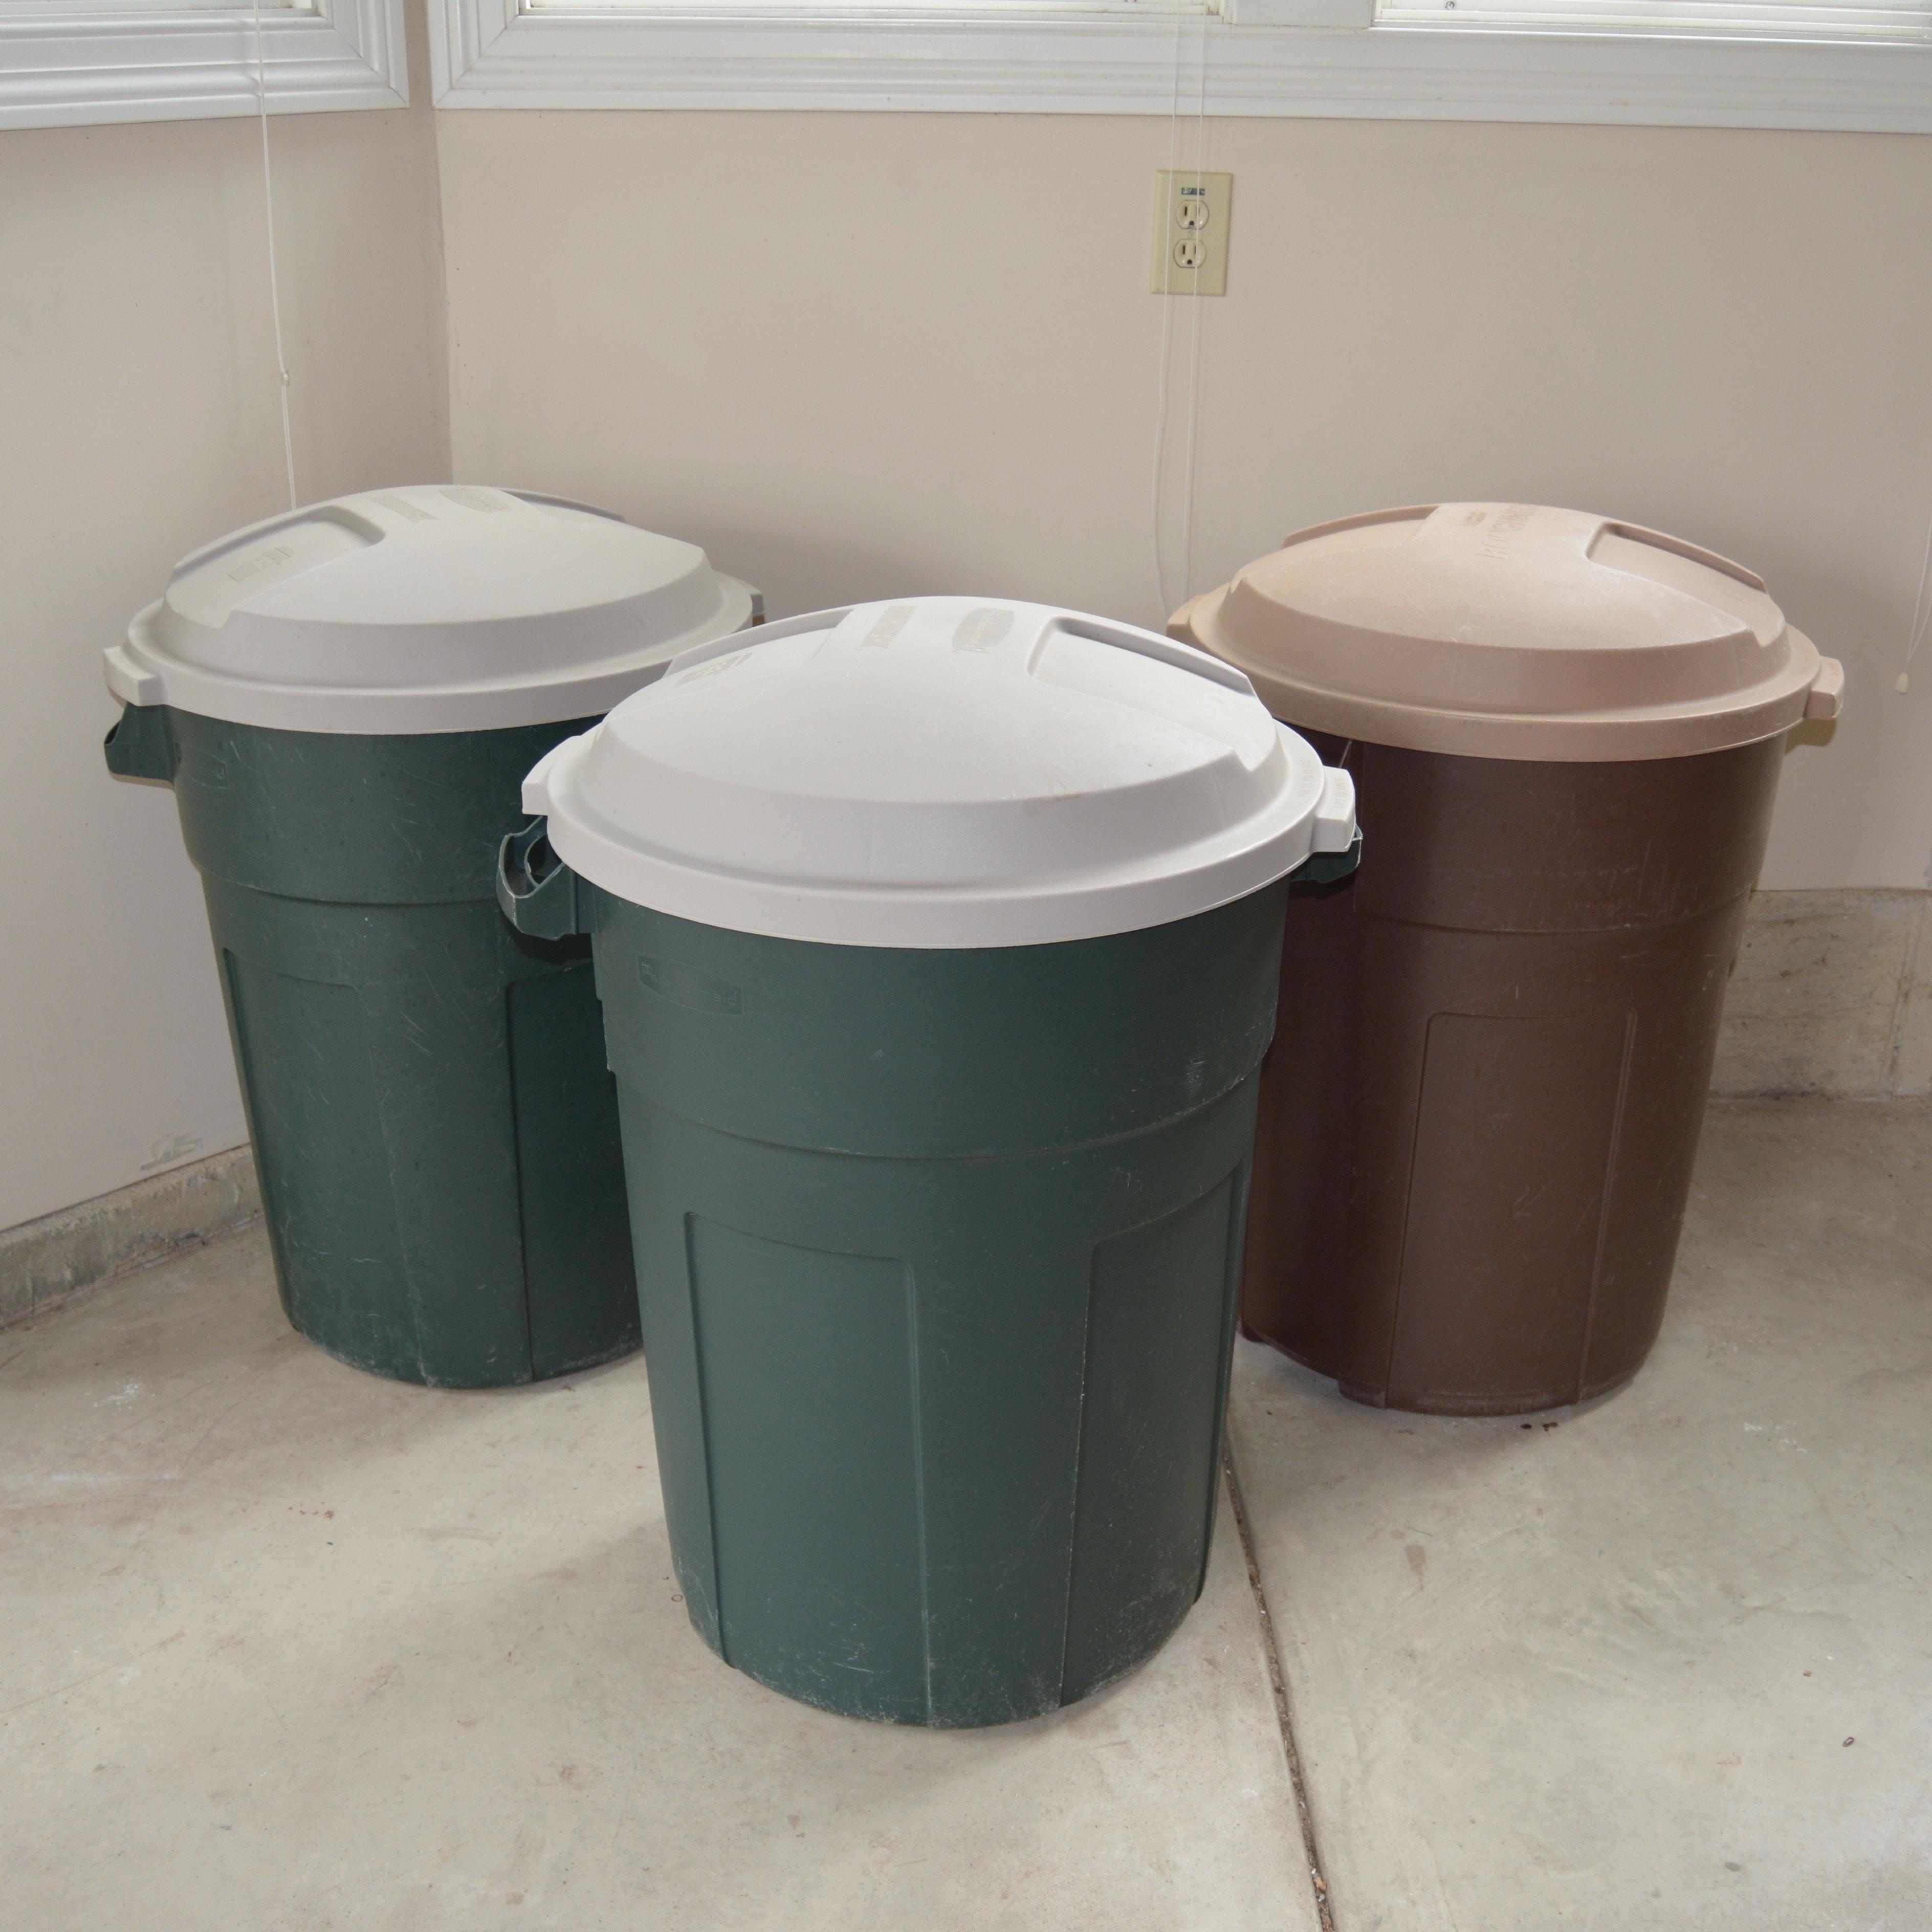 Rubbermaid Roughneck 32 Gallon Trash Cans